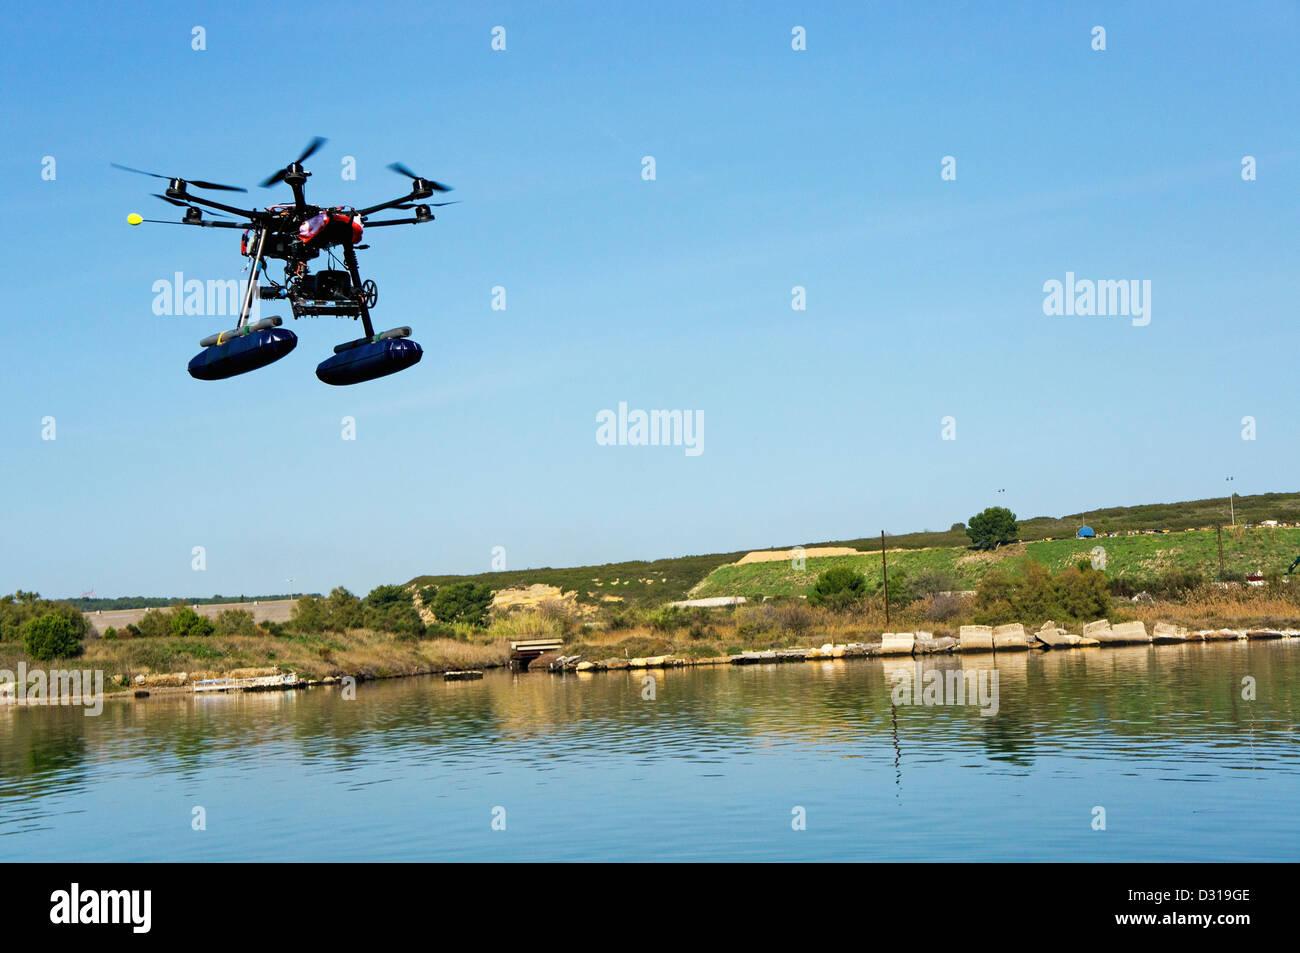 Zumbido o vehículo aéreo no tripulado (UAV) utilizado para fotografía / filmación volando por Imagen De Stock